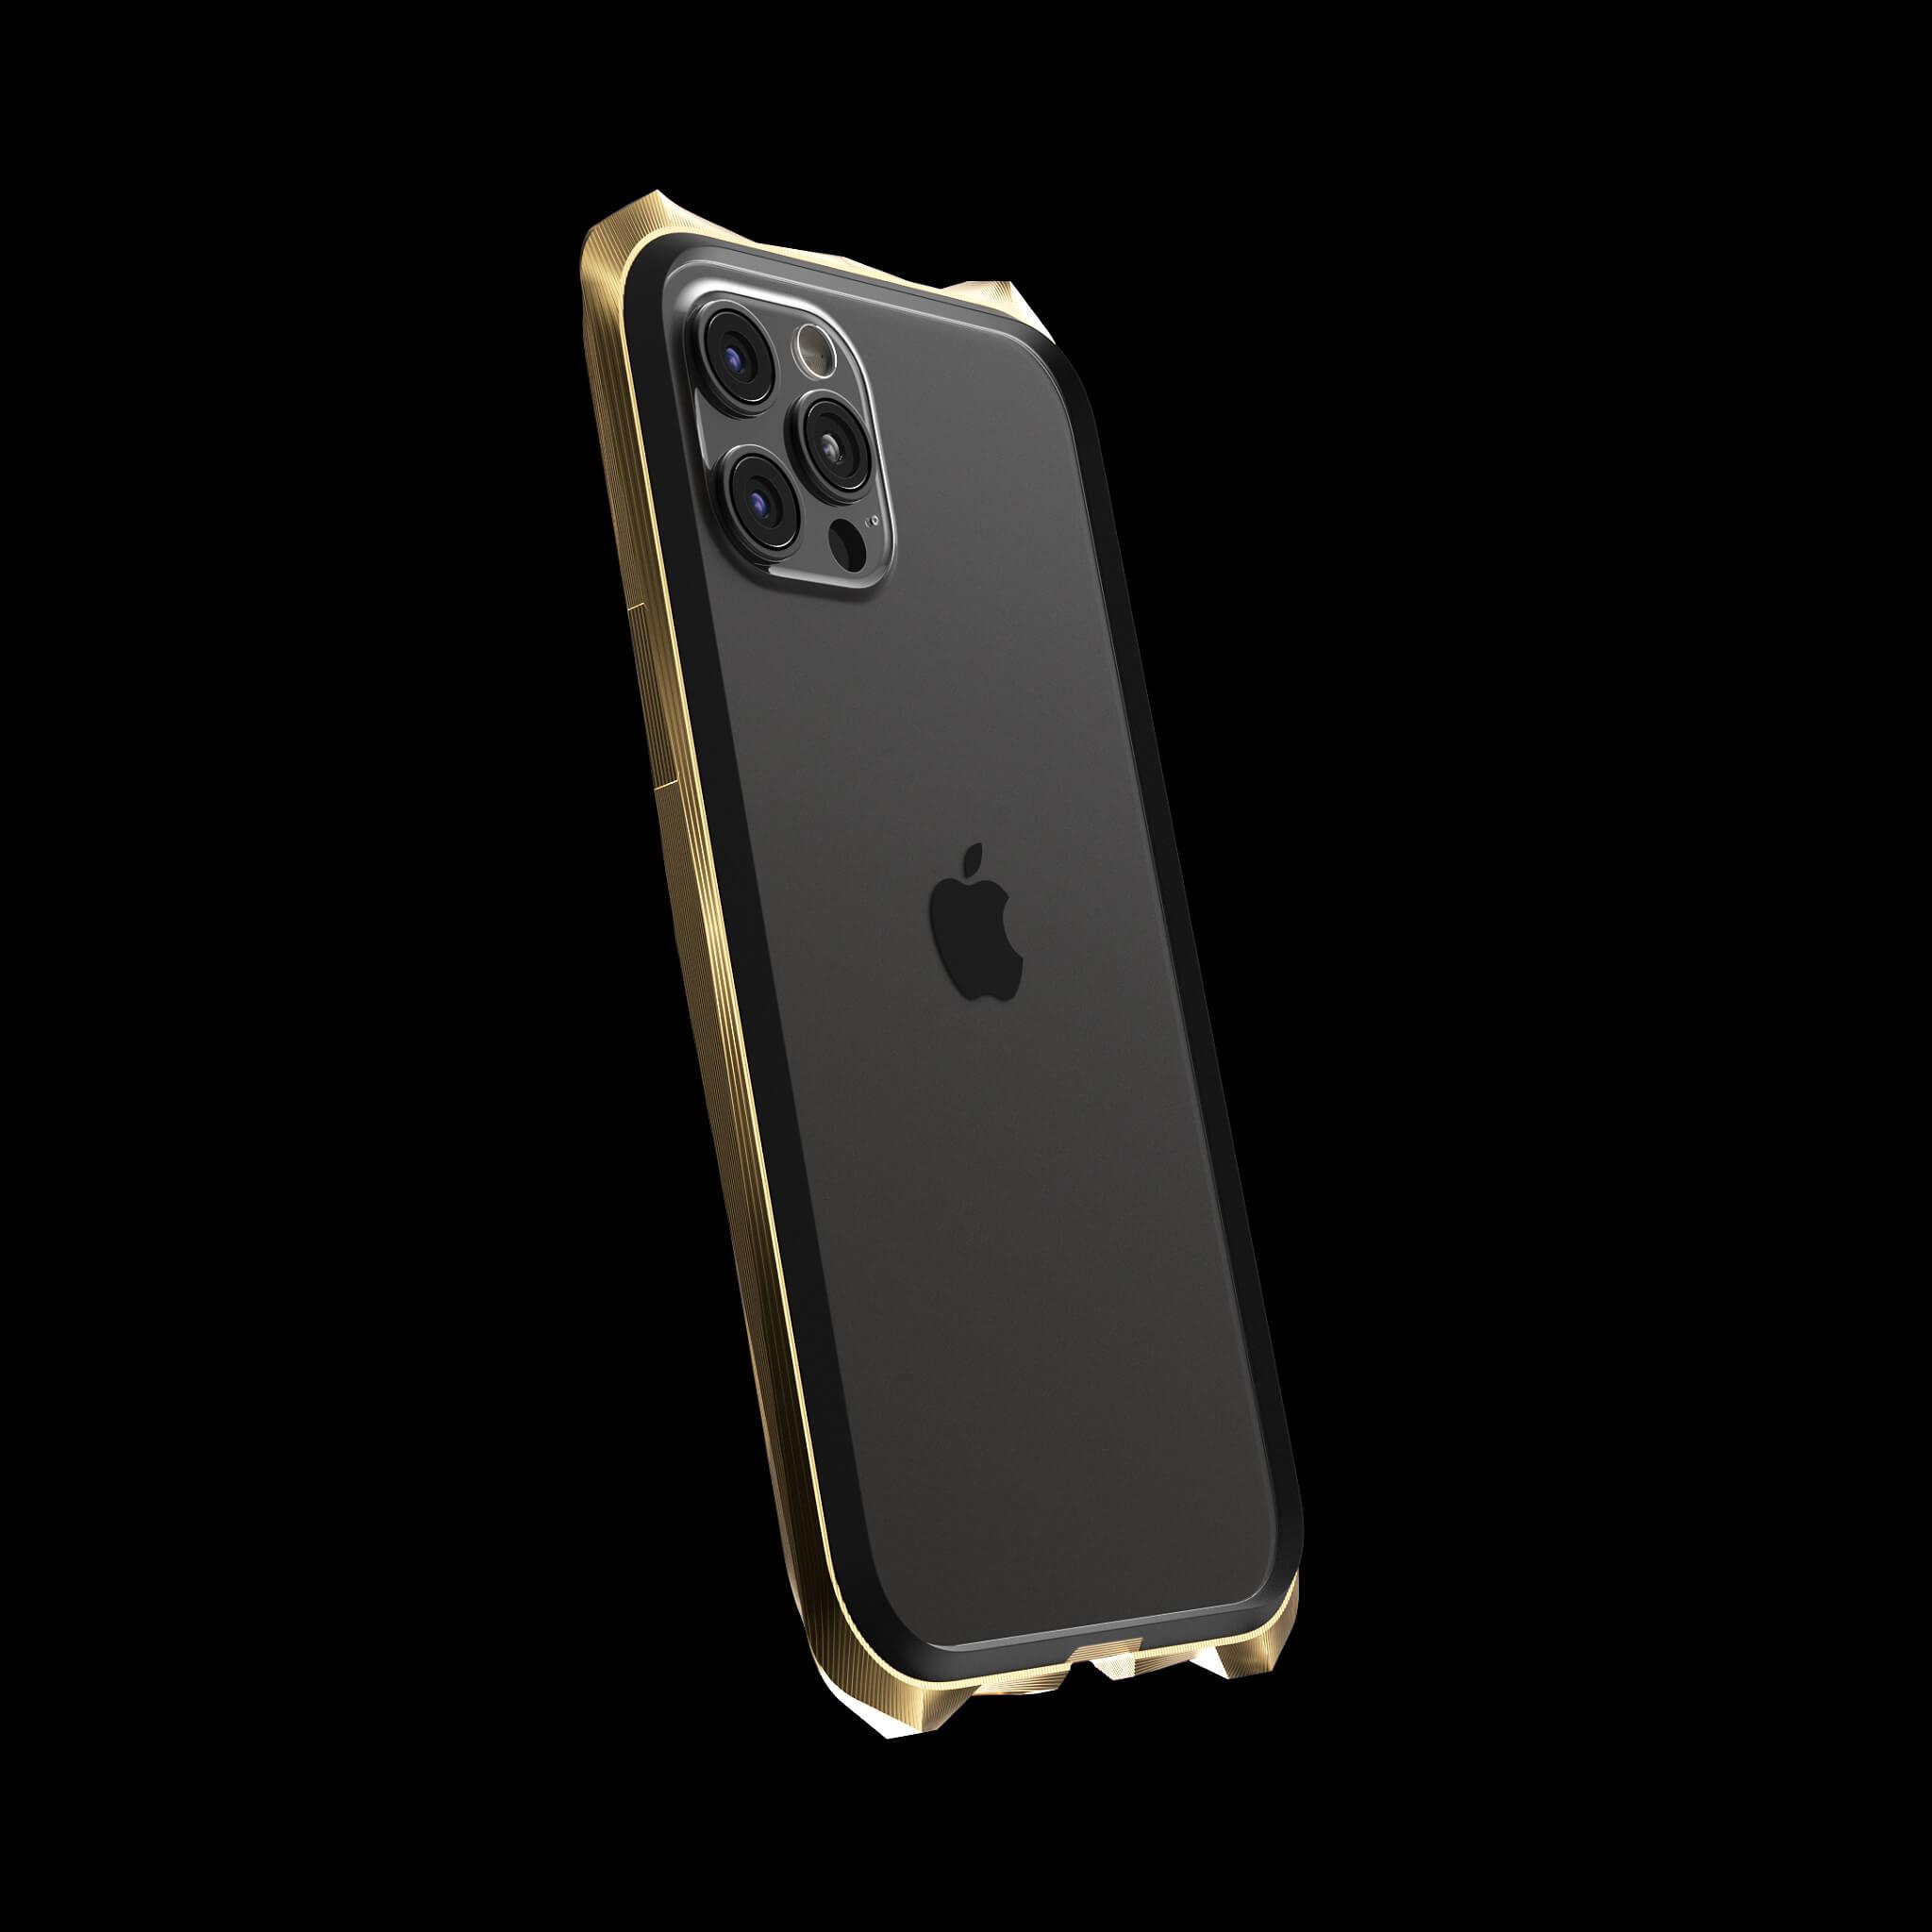 advent gold pvd coated luxury titanium iphone 12 pro case